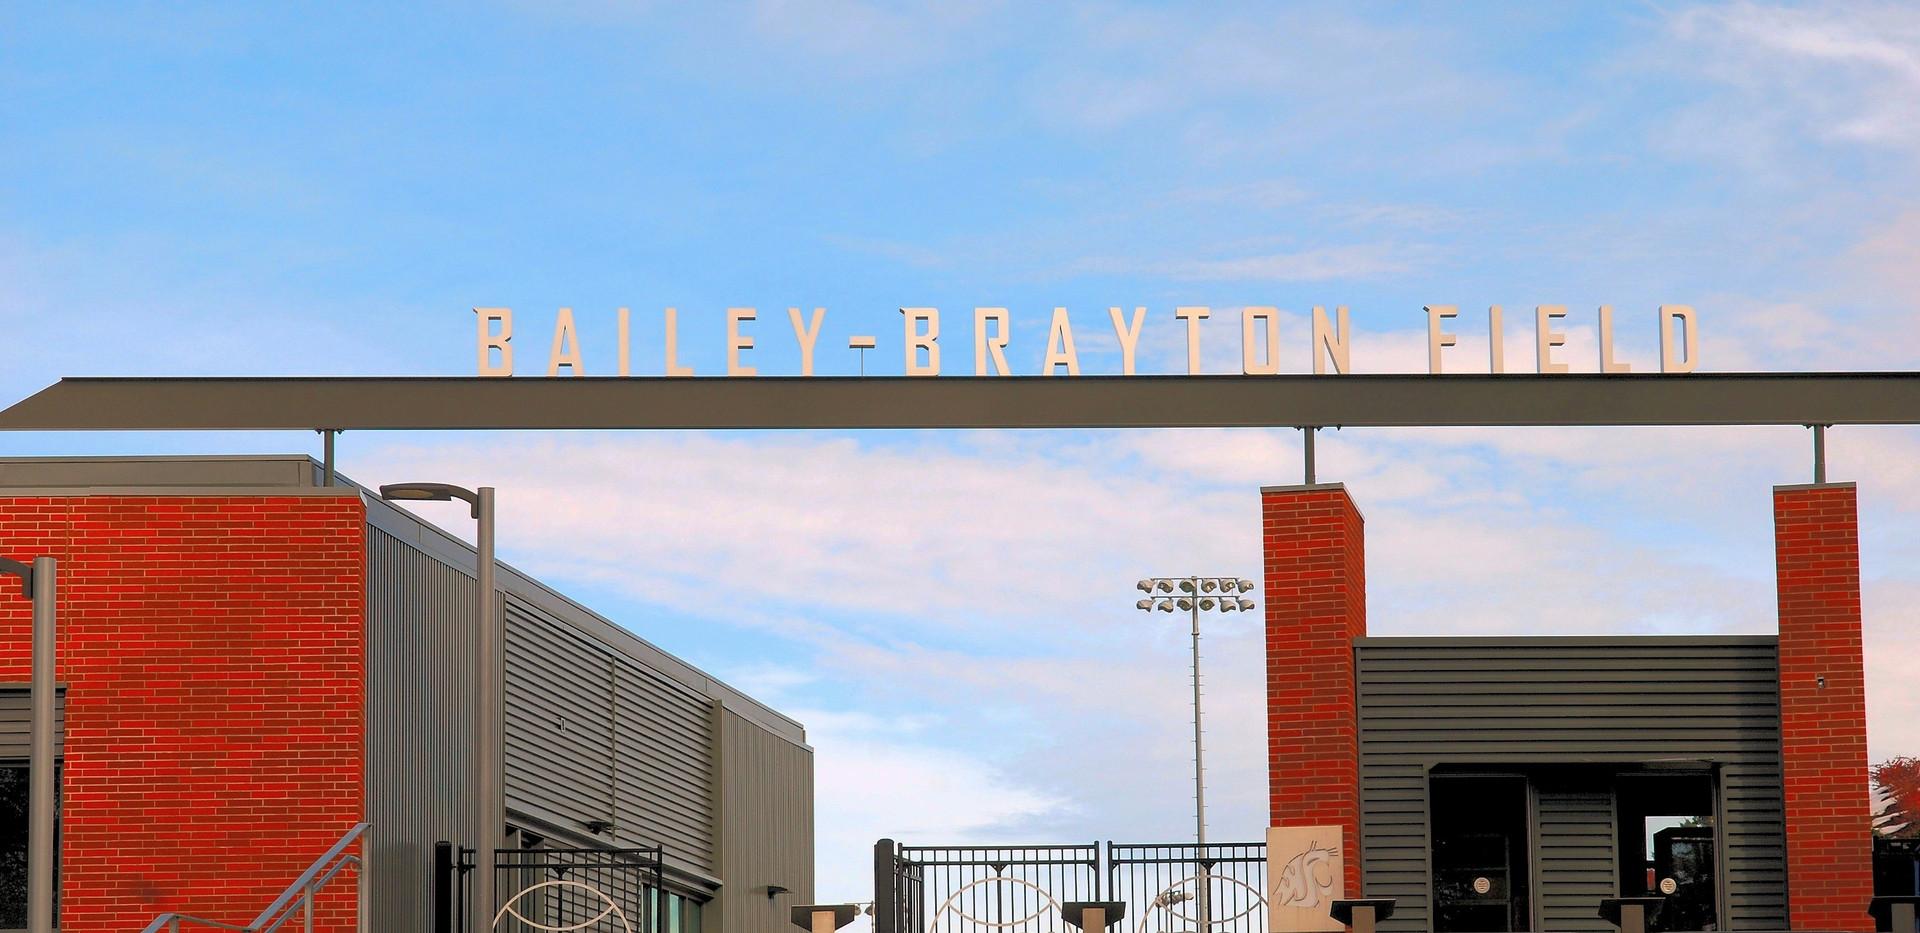 Bailey-Brayton Field